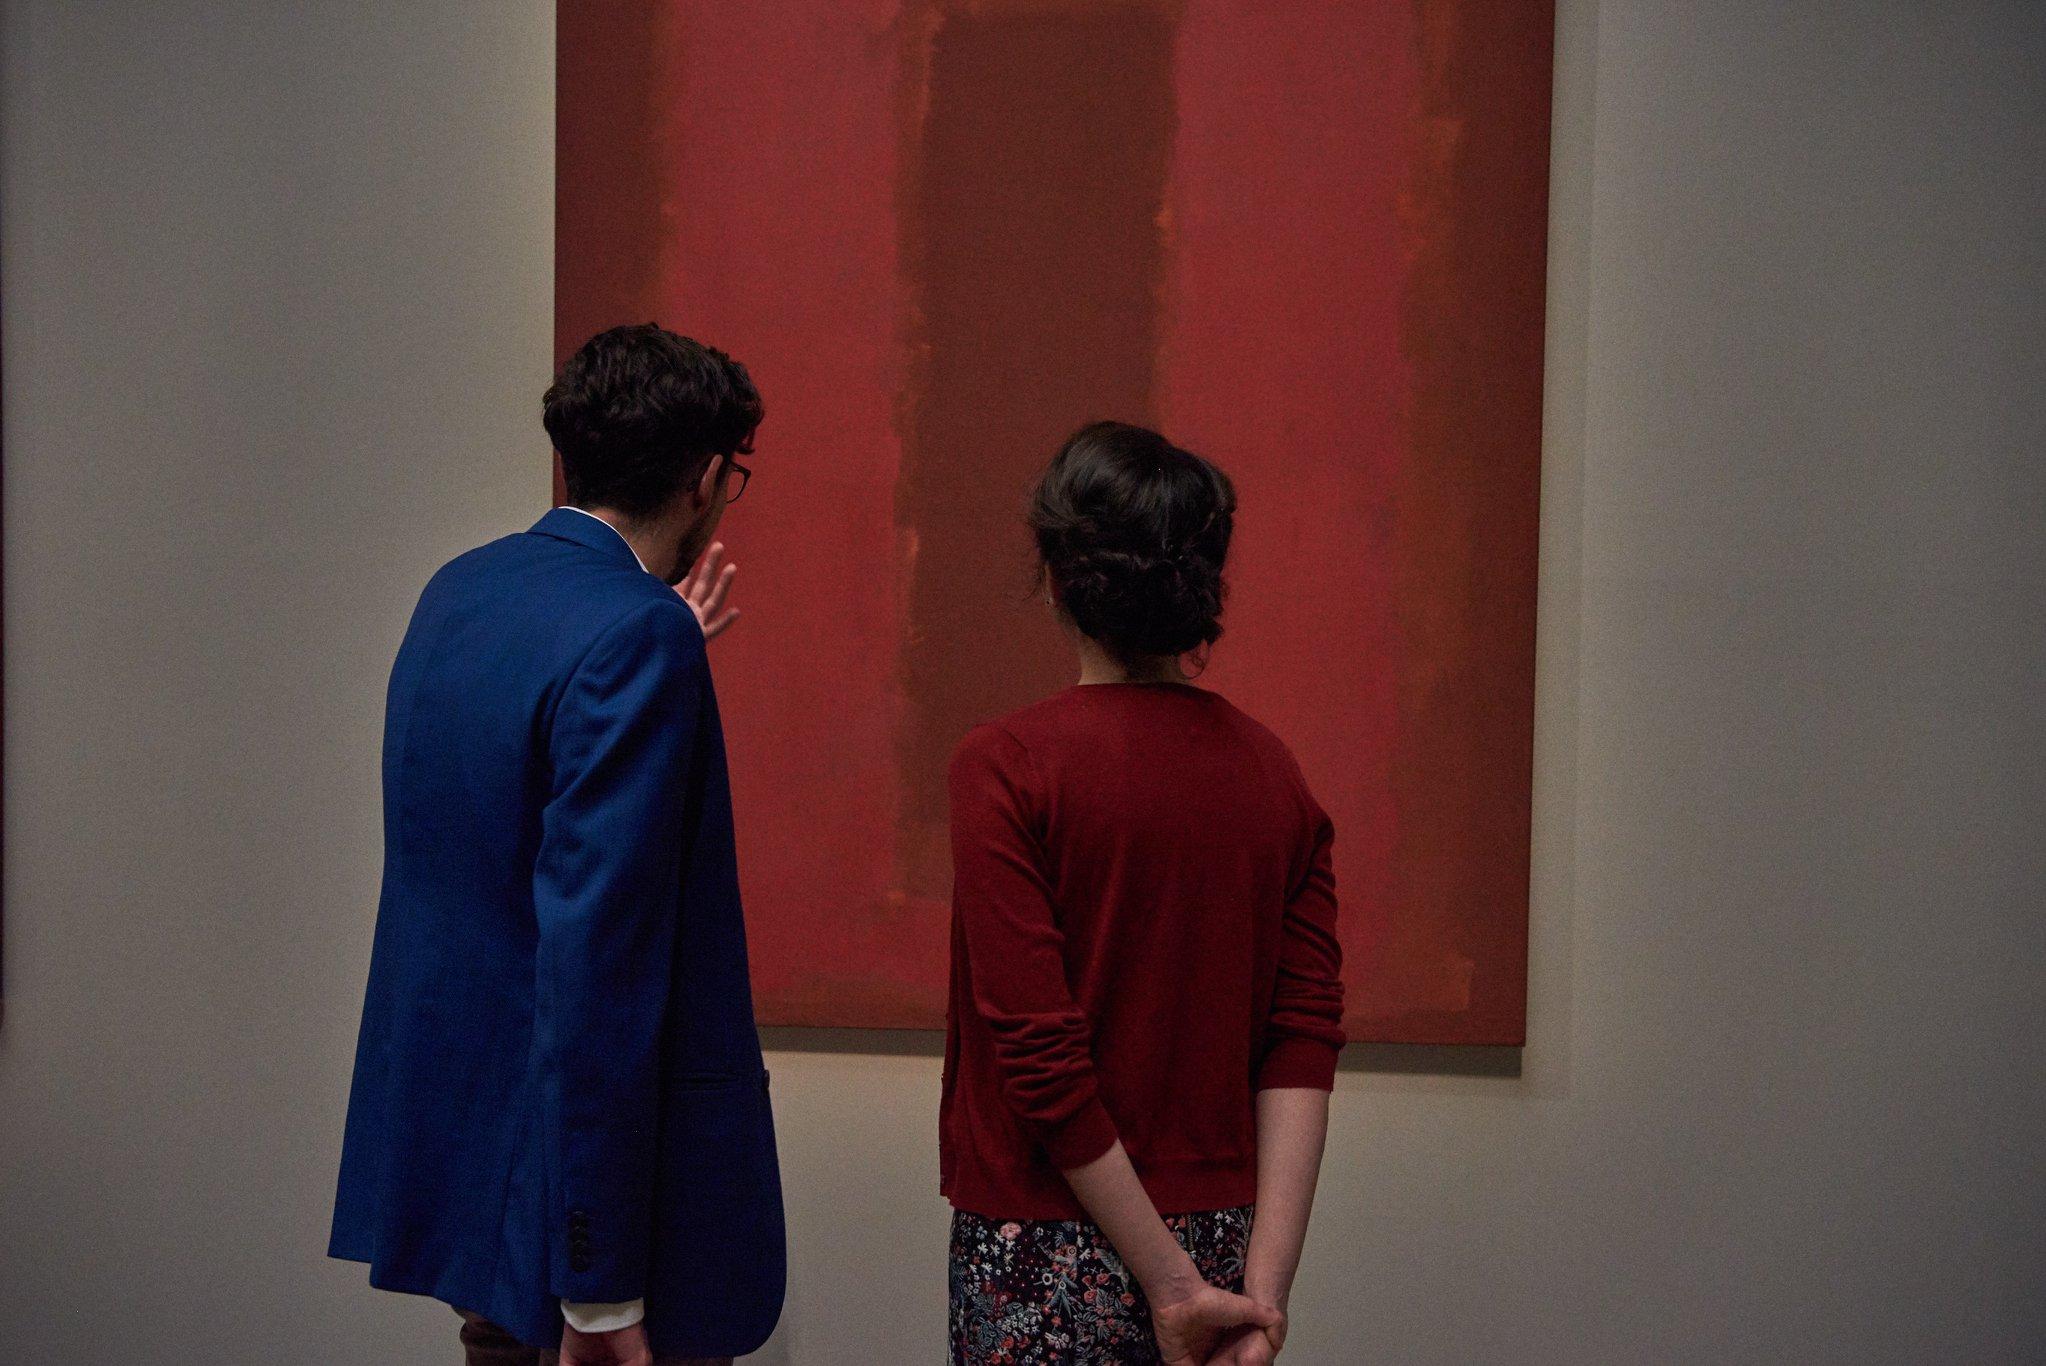 Kate Rothko Prizel & Christopher Rothko/Bildrecht, Wien, 2019